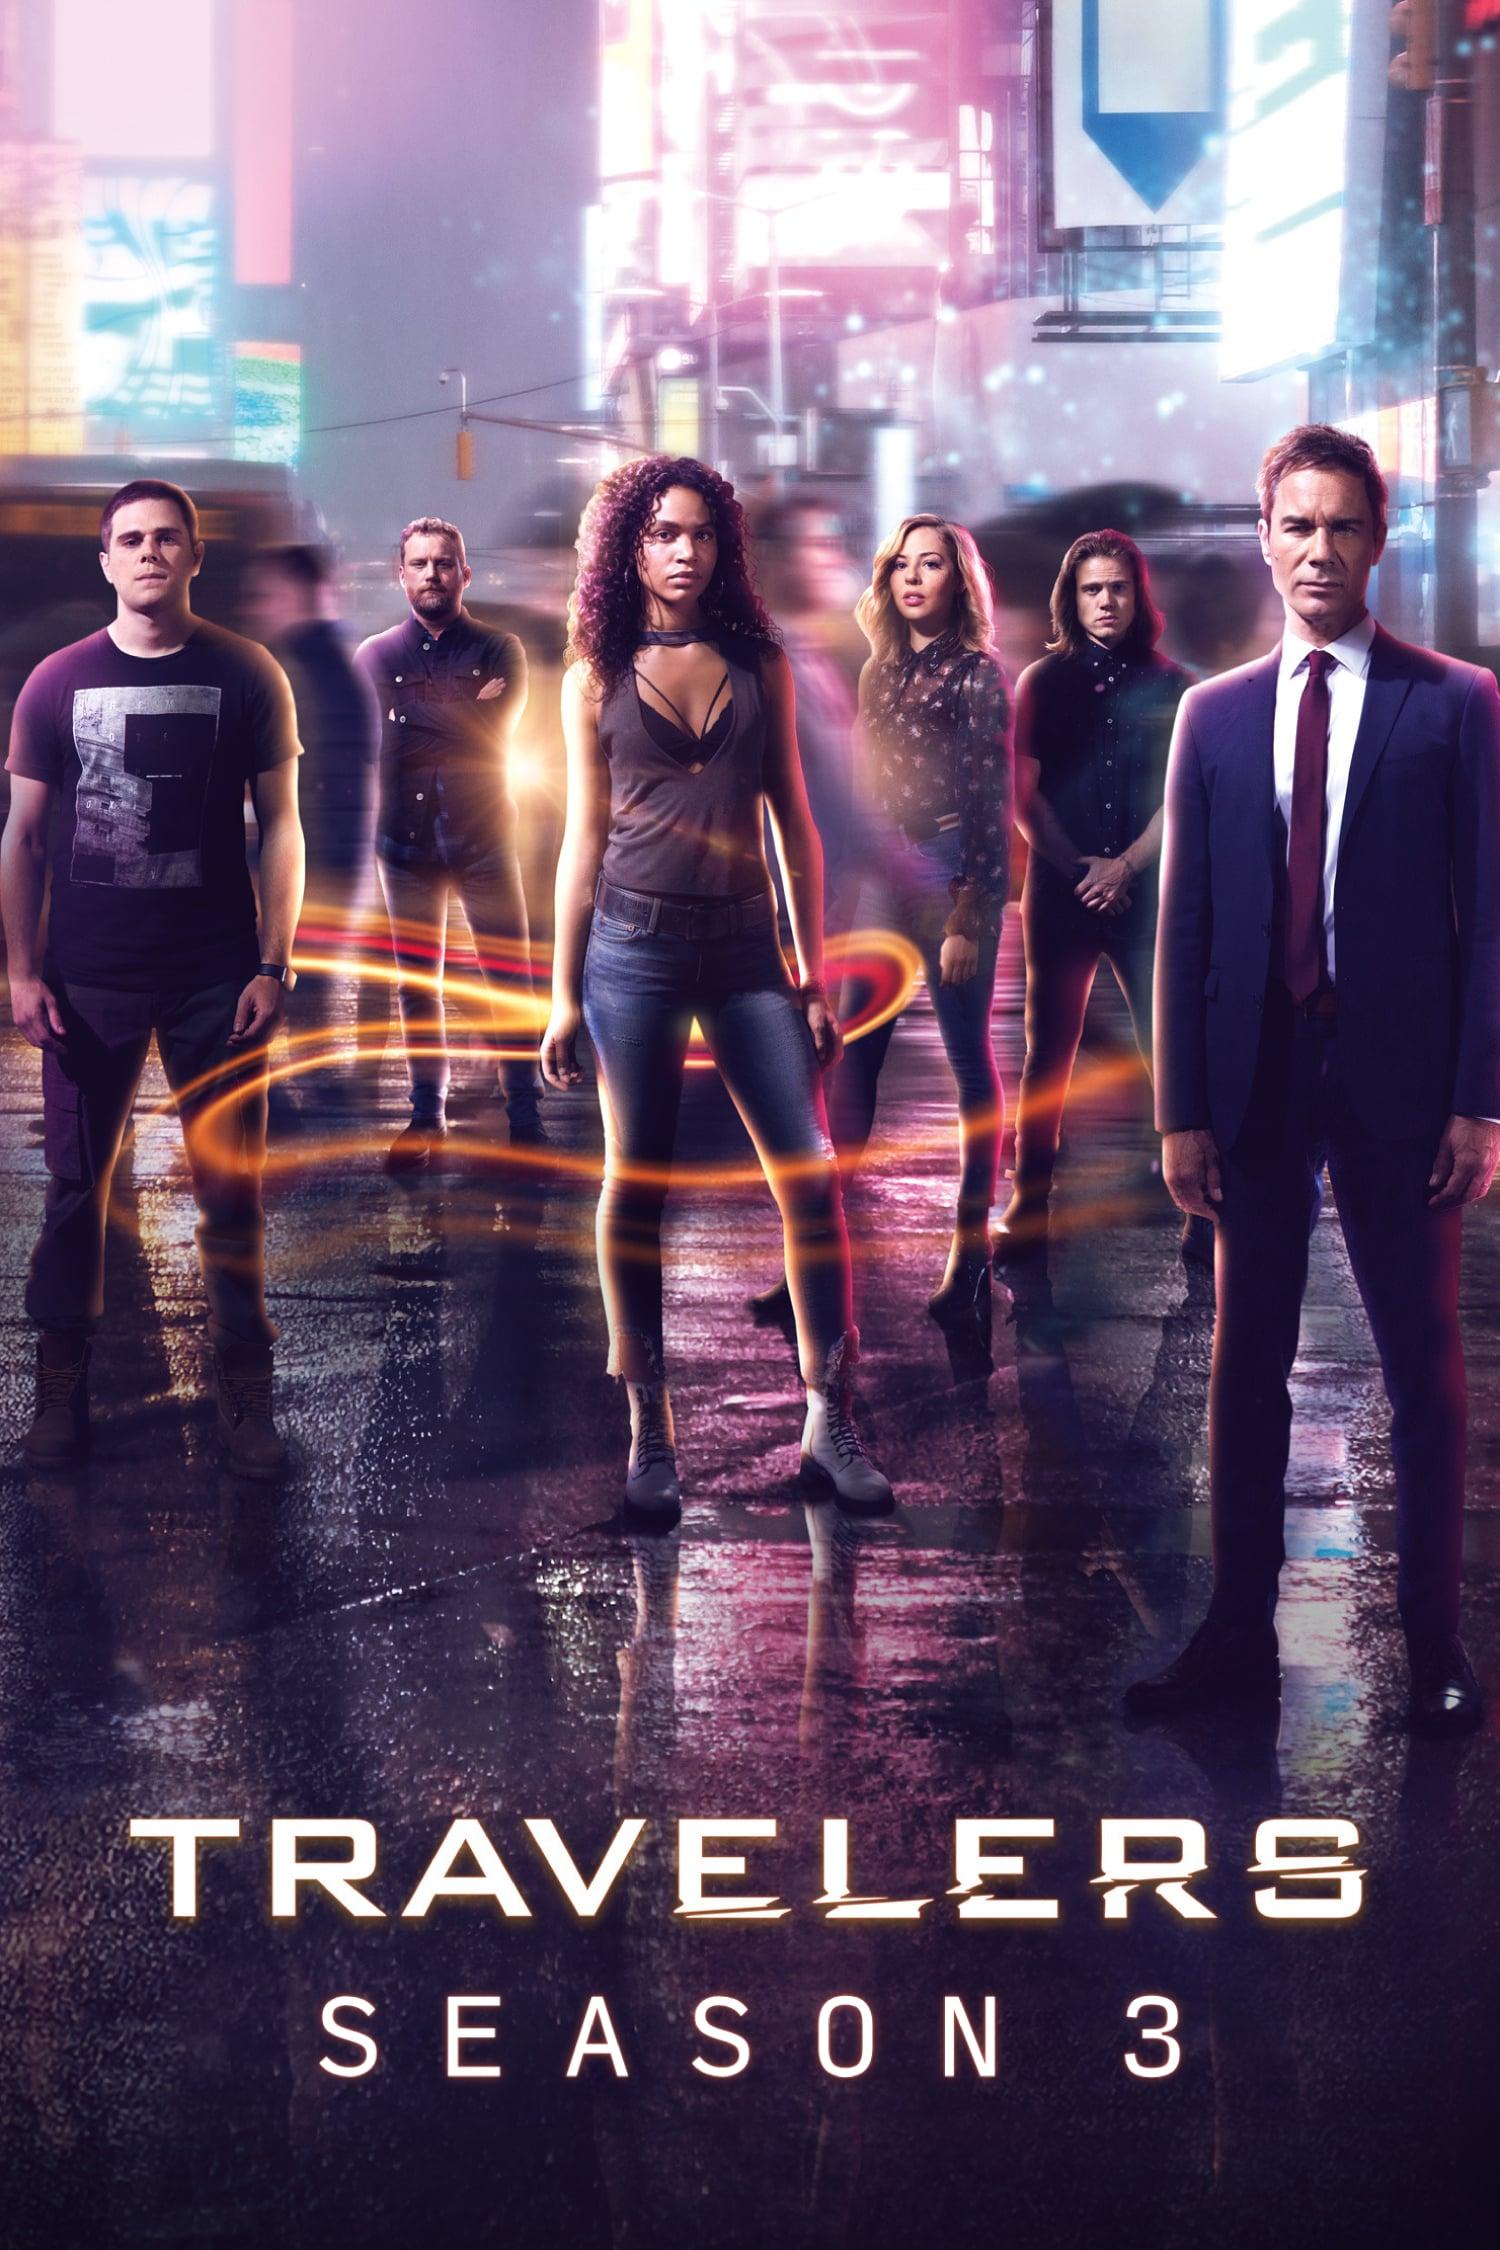 season 4 of Travelers